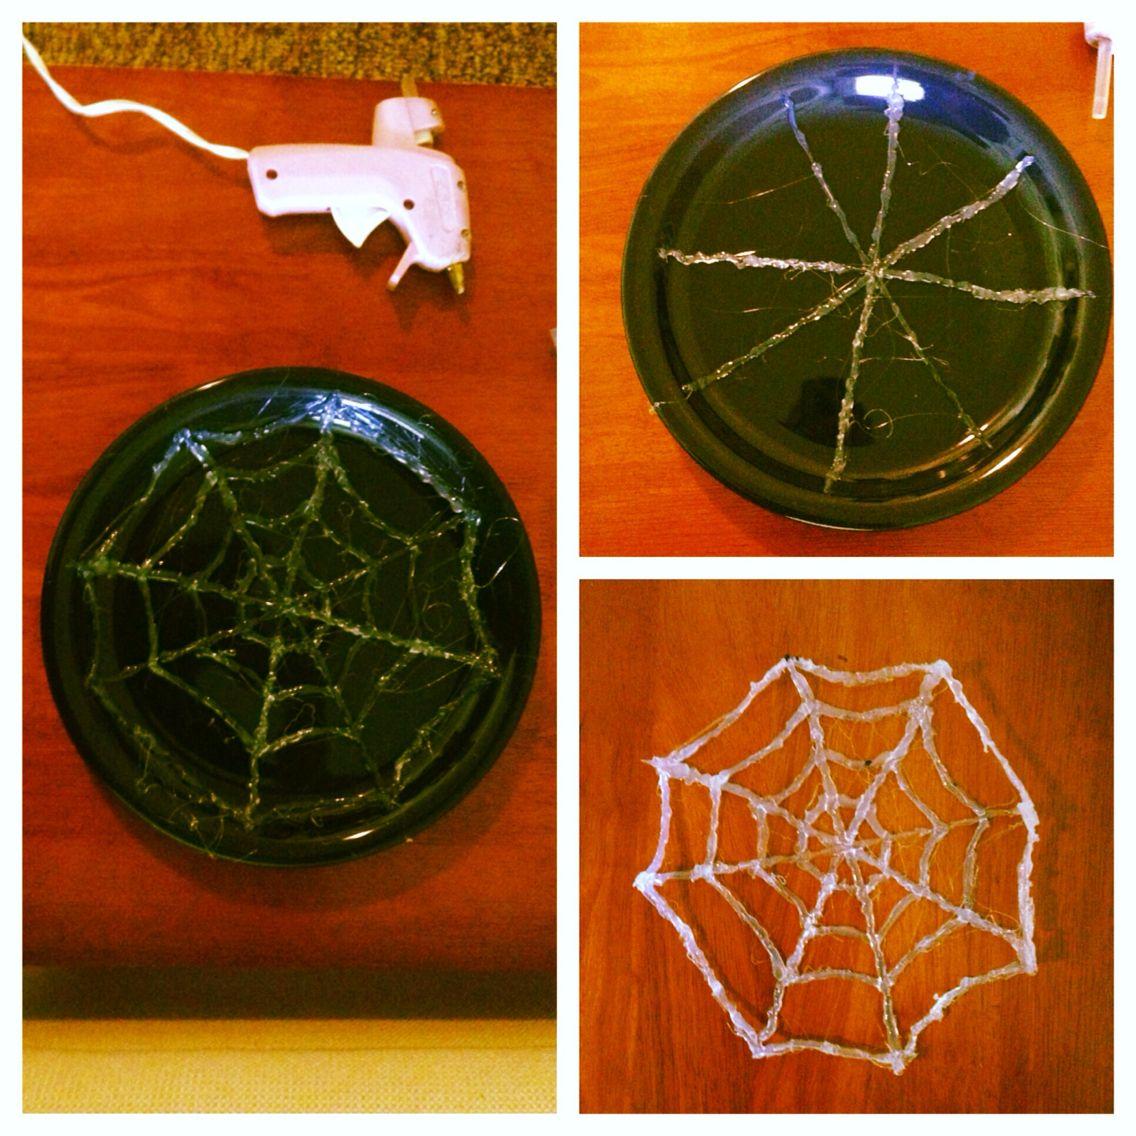 Diy spider web. #gluegun #decorations #siderweb #diy #craft #halloweendecor #handmade #halloween